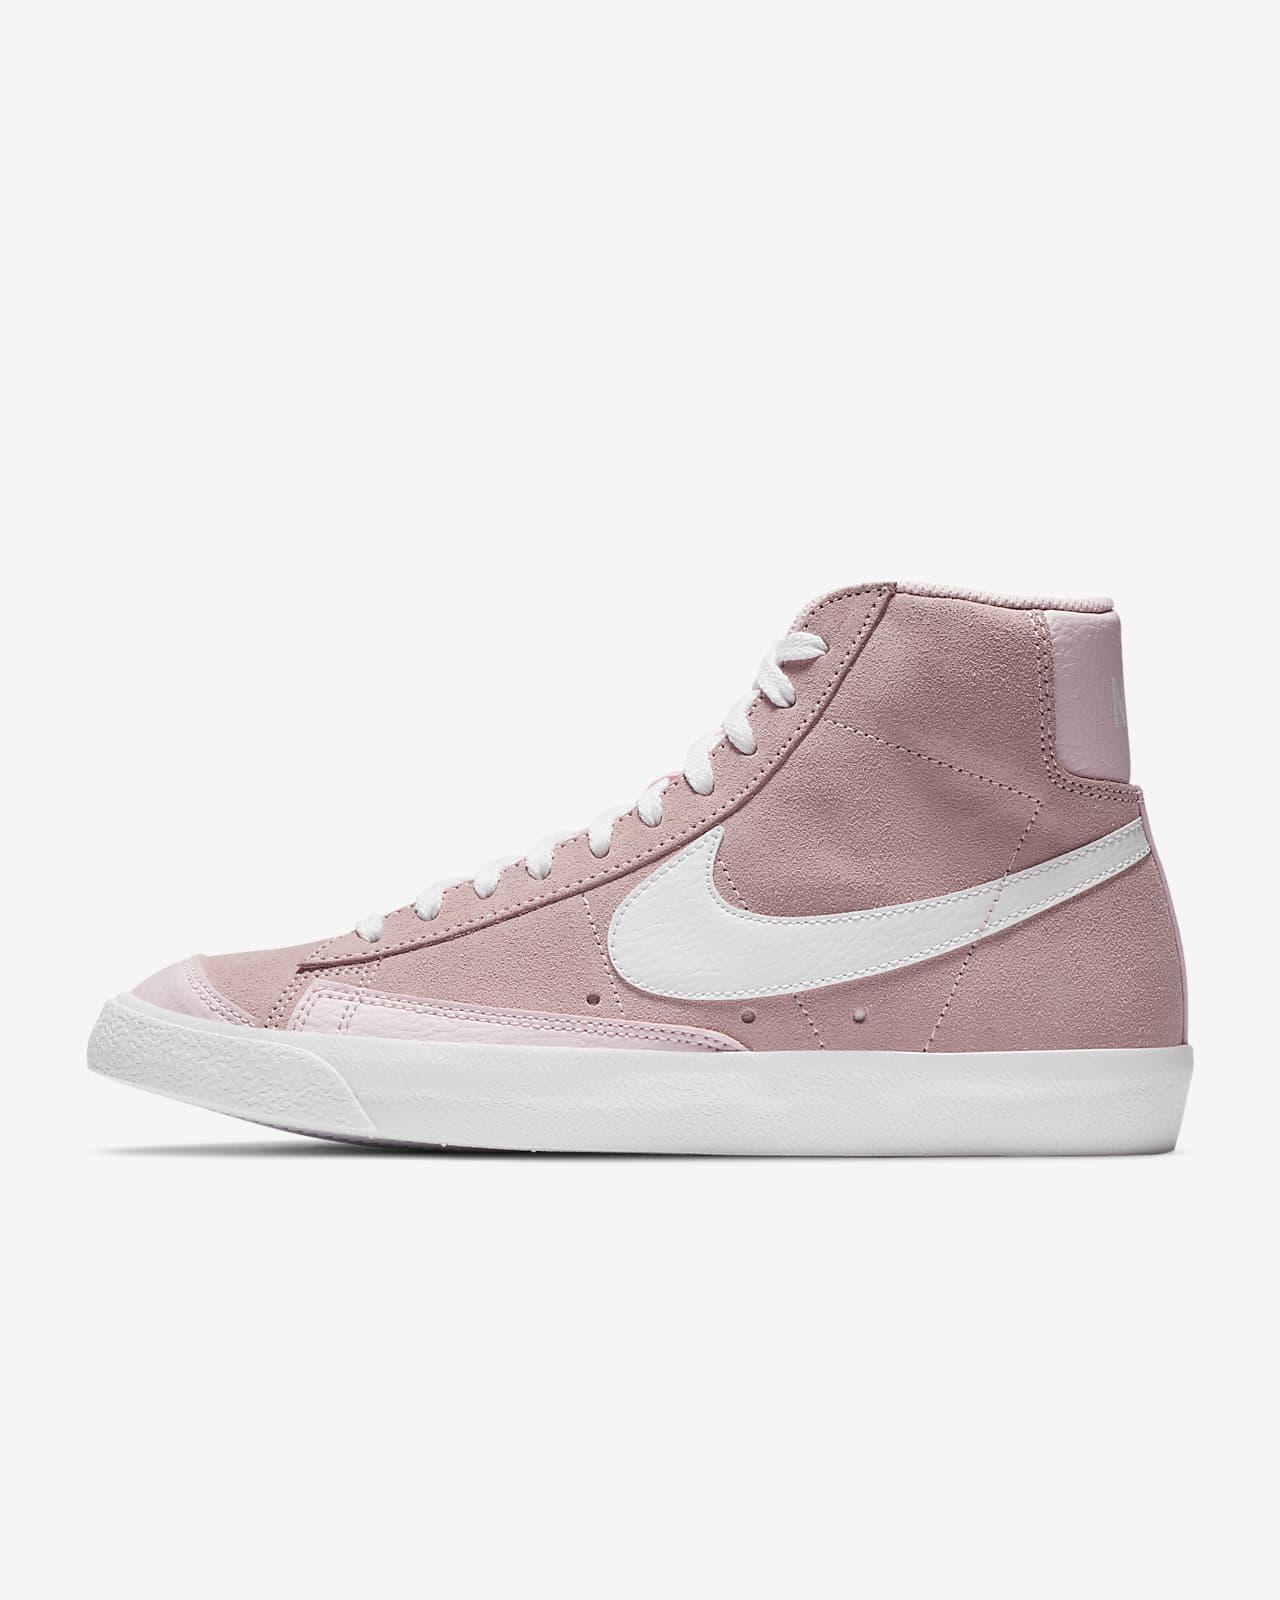 Nike Blazer Mid Vintage '77 Women's Shoe